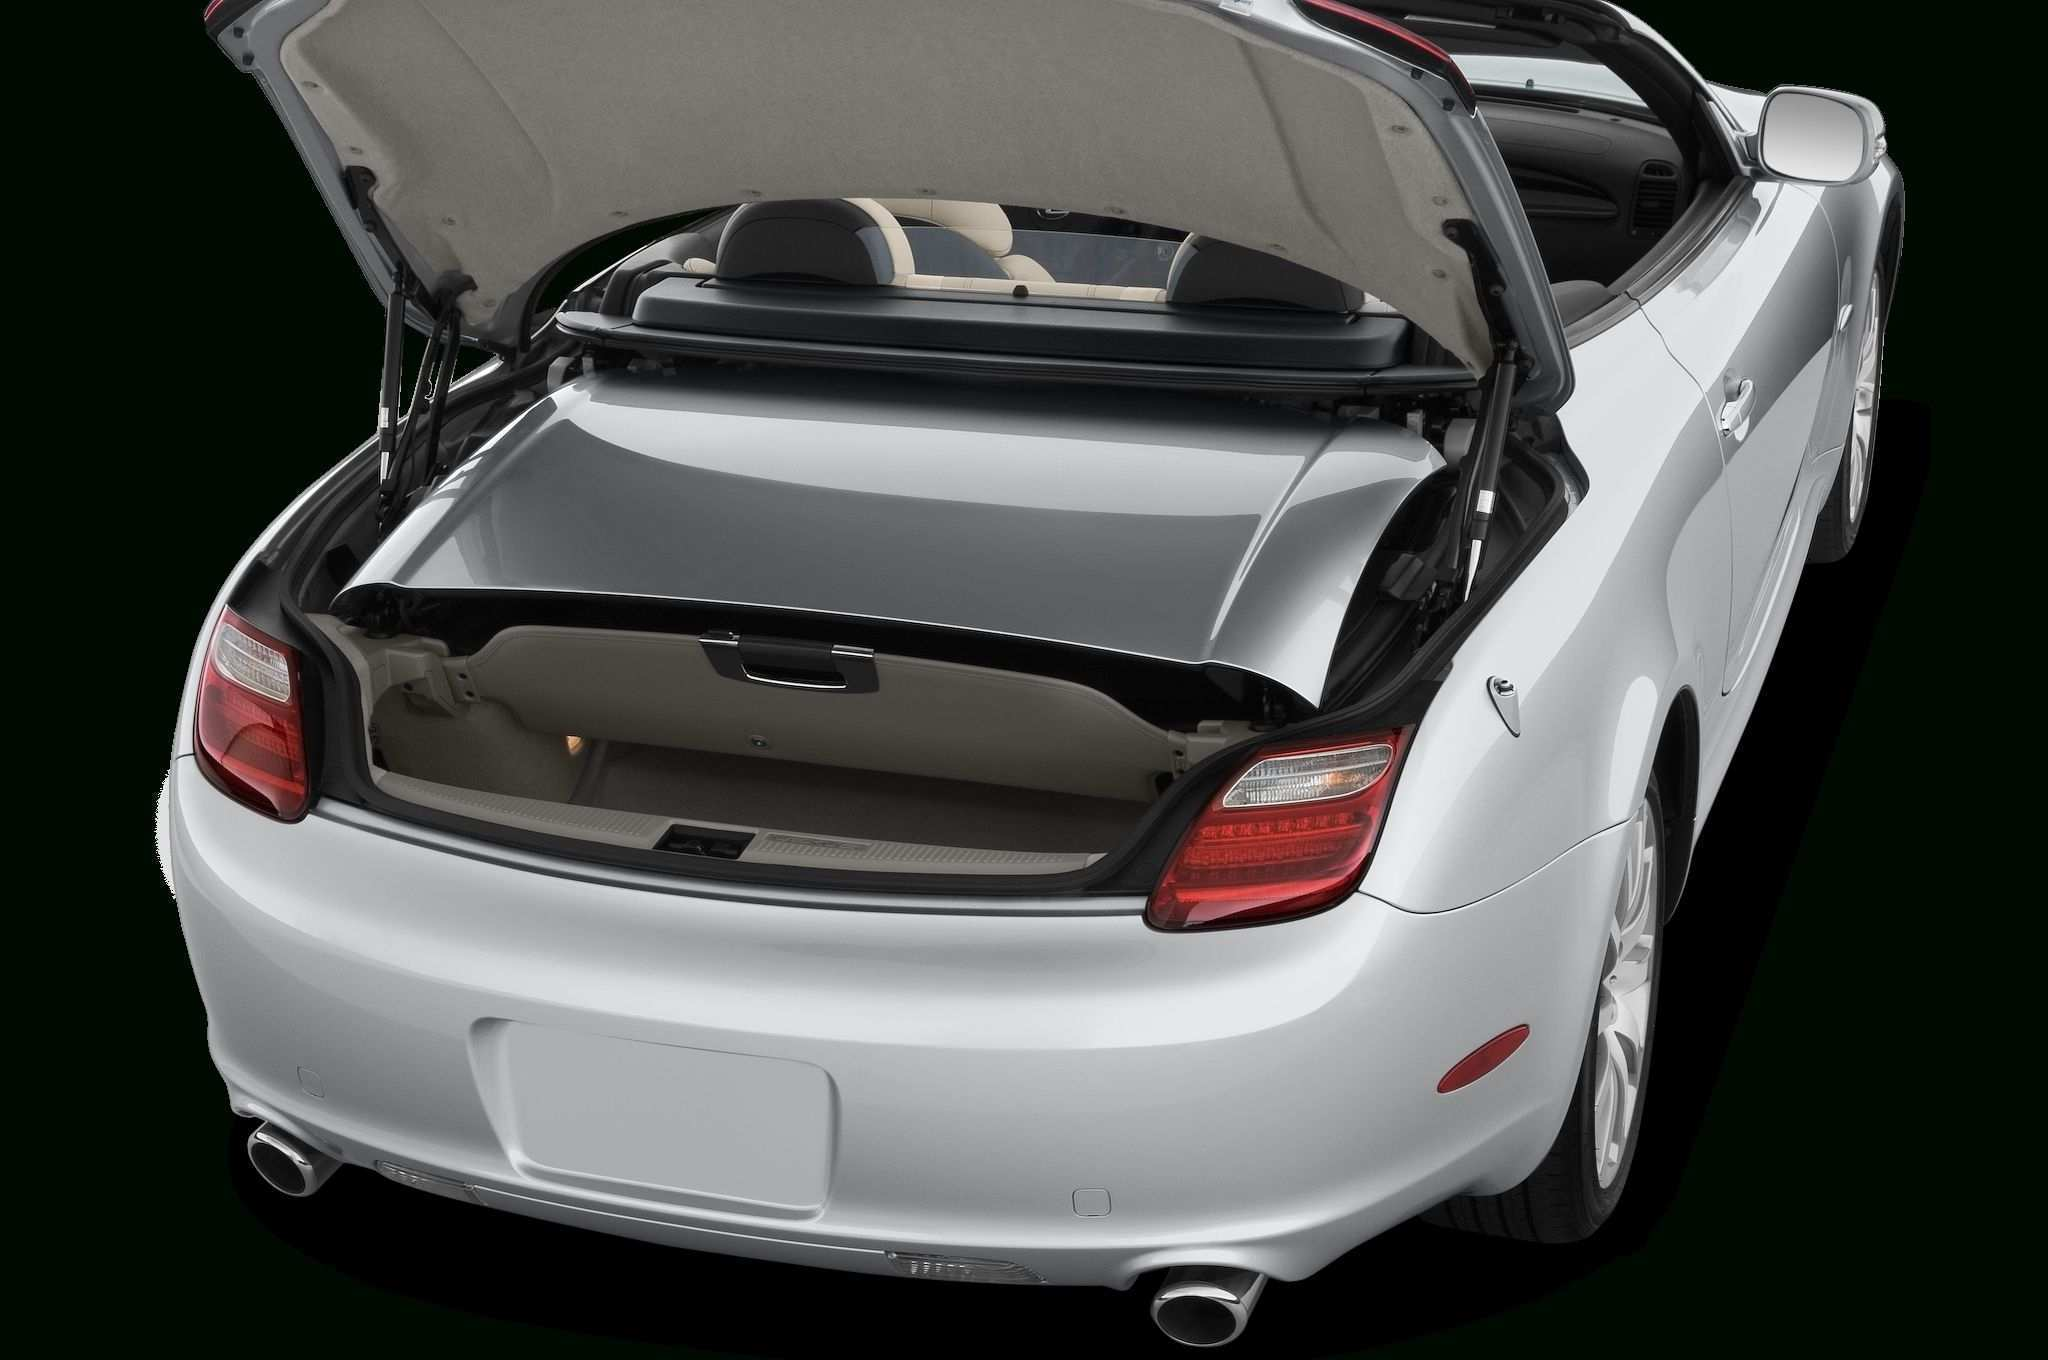 61 Concept of Lexus Sc 2020 Specs by Lexus Sc 2020